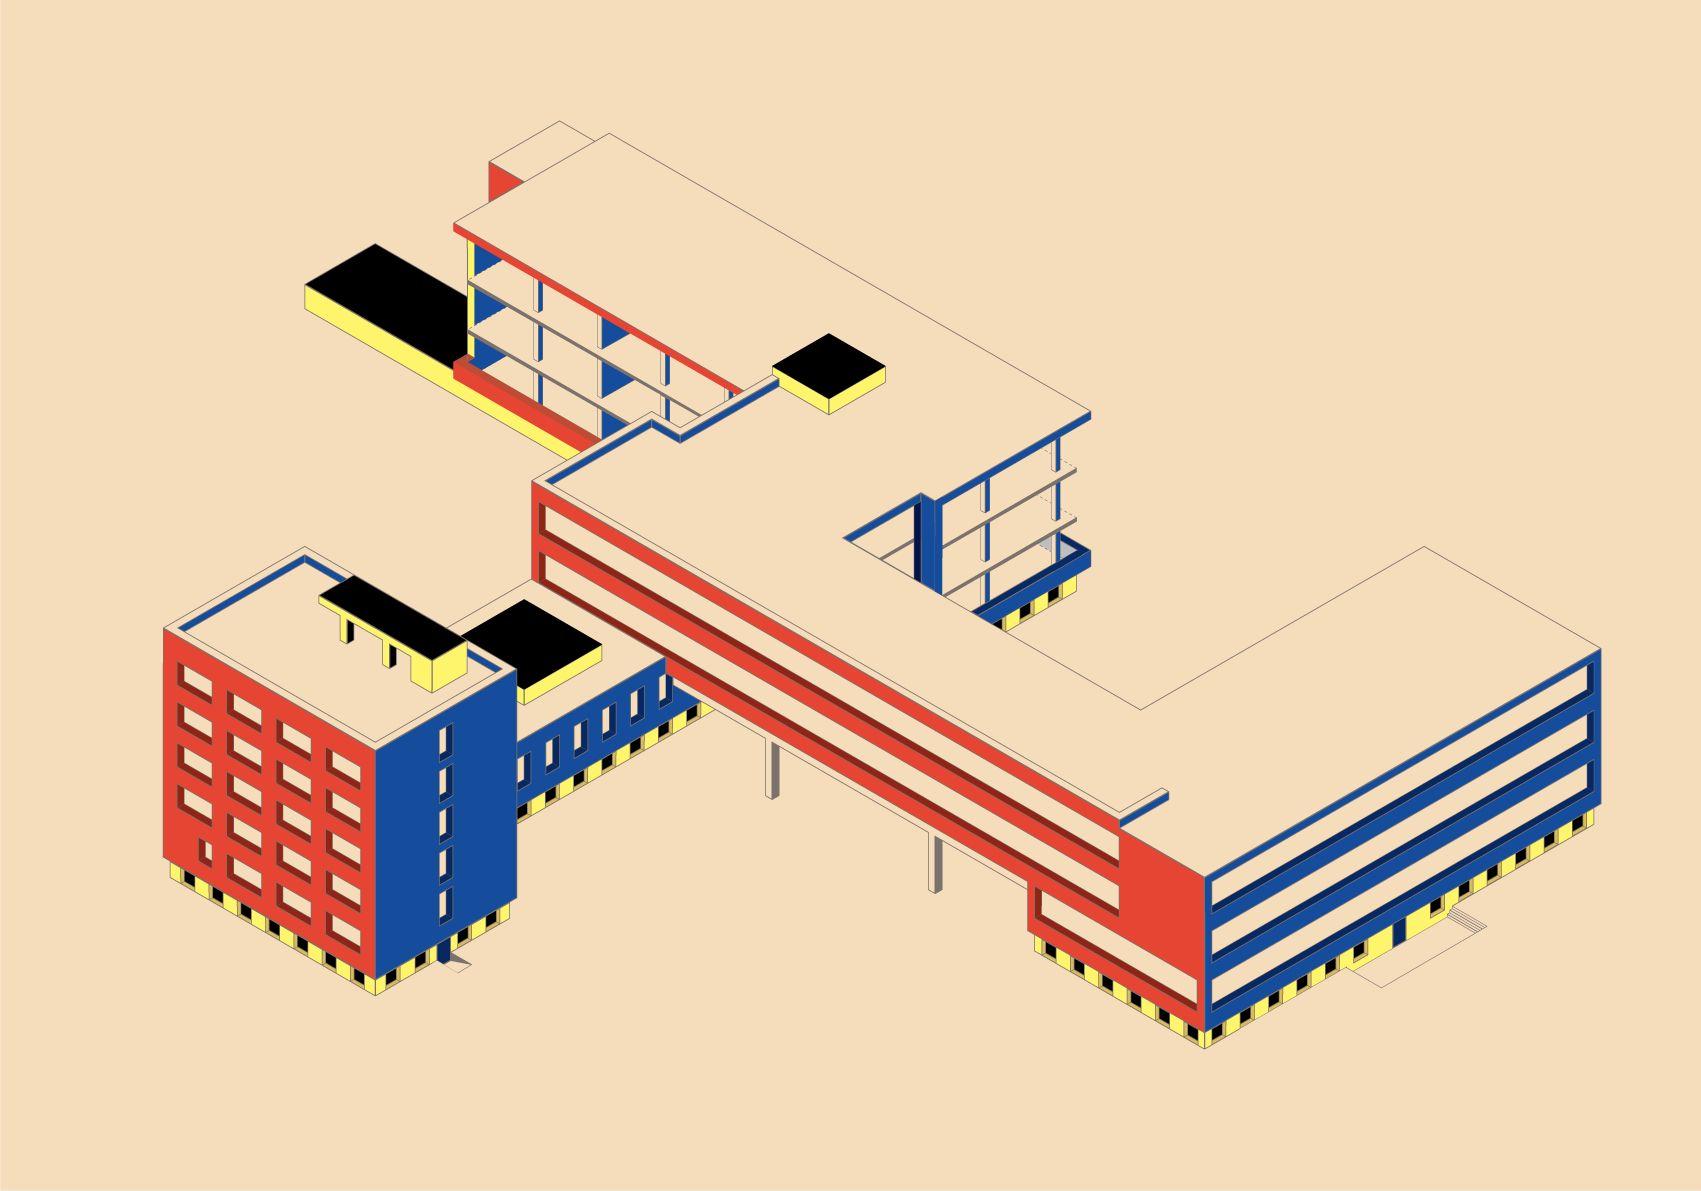 Architectural Axonometric Bauhaus Architecture Bauhaus Design